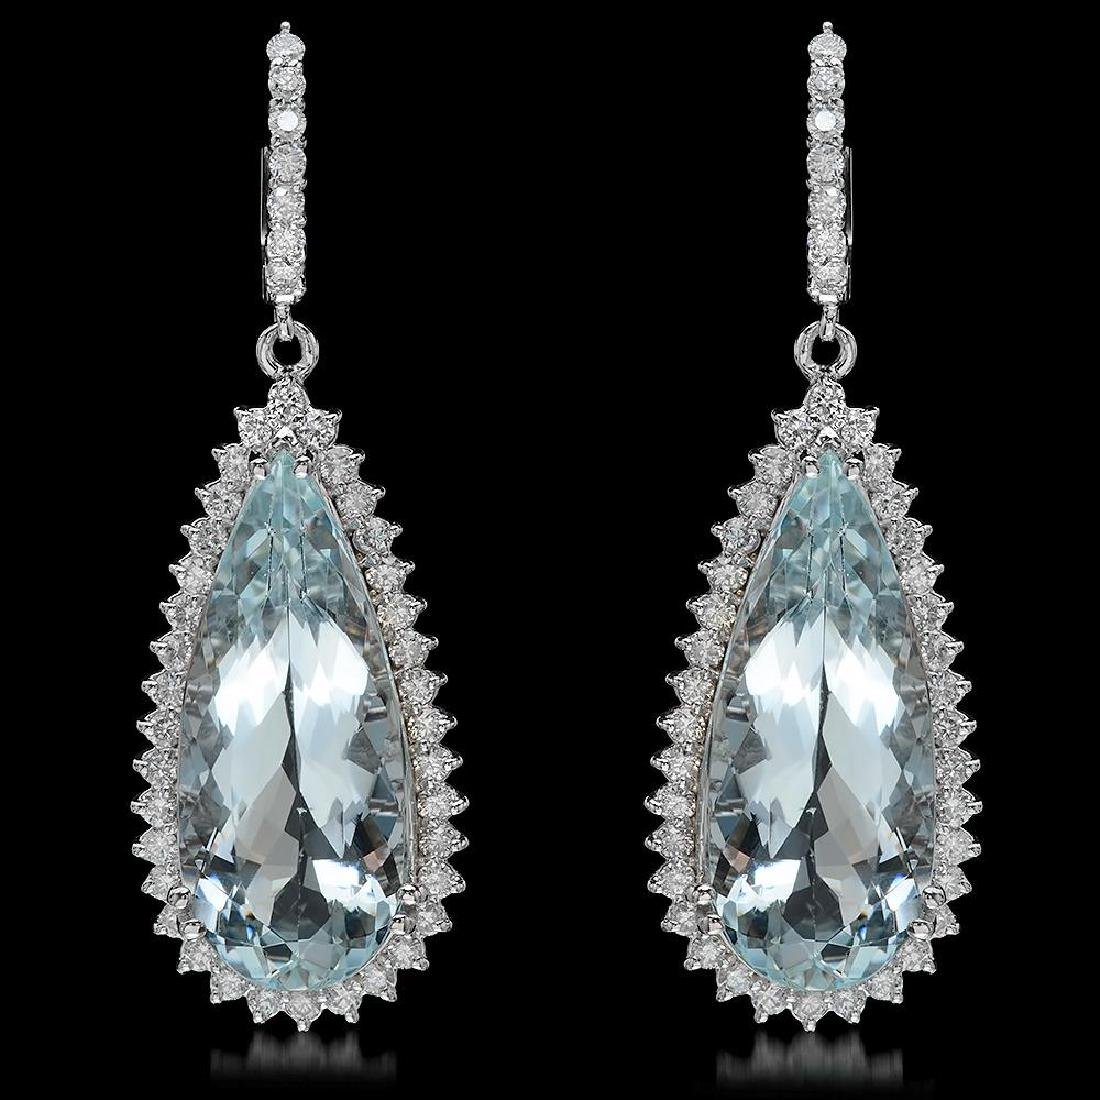 14K Gold 28.67ct Aquamarine 2.41ct Diamond Earrings